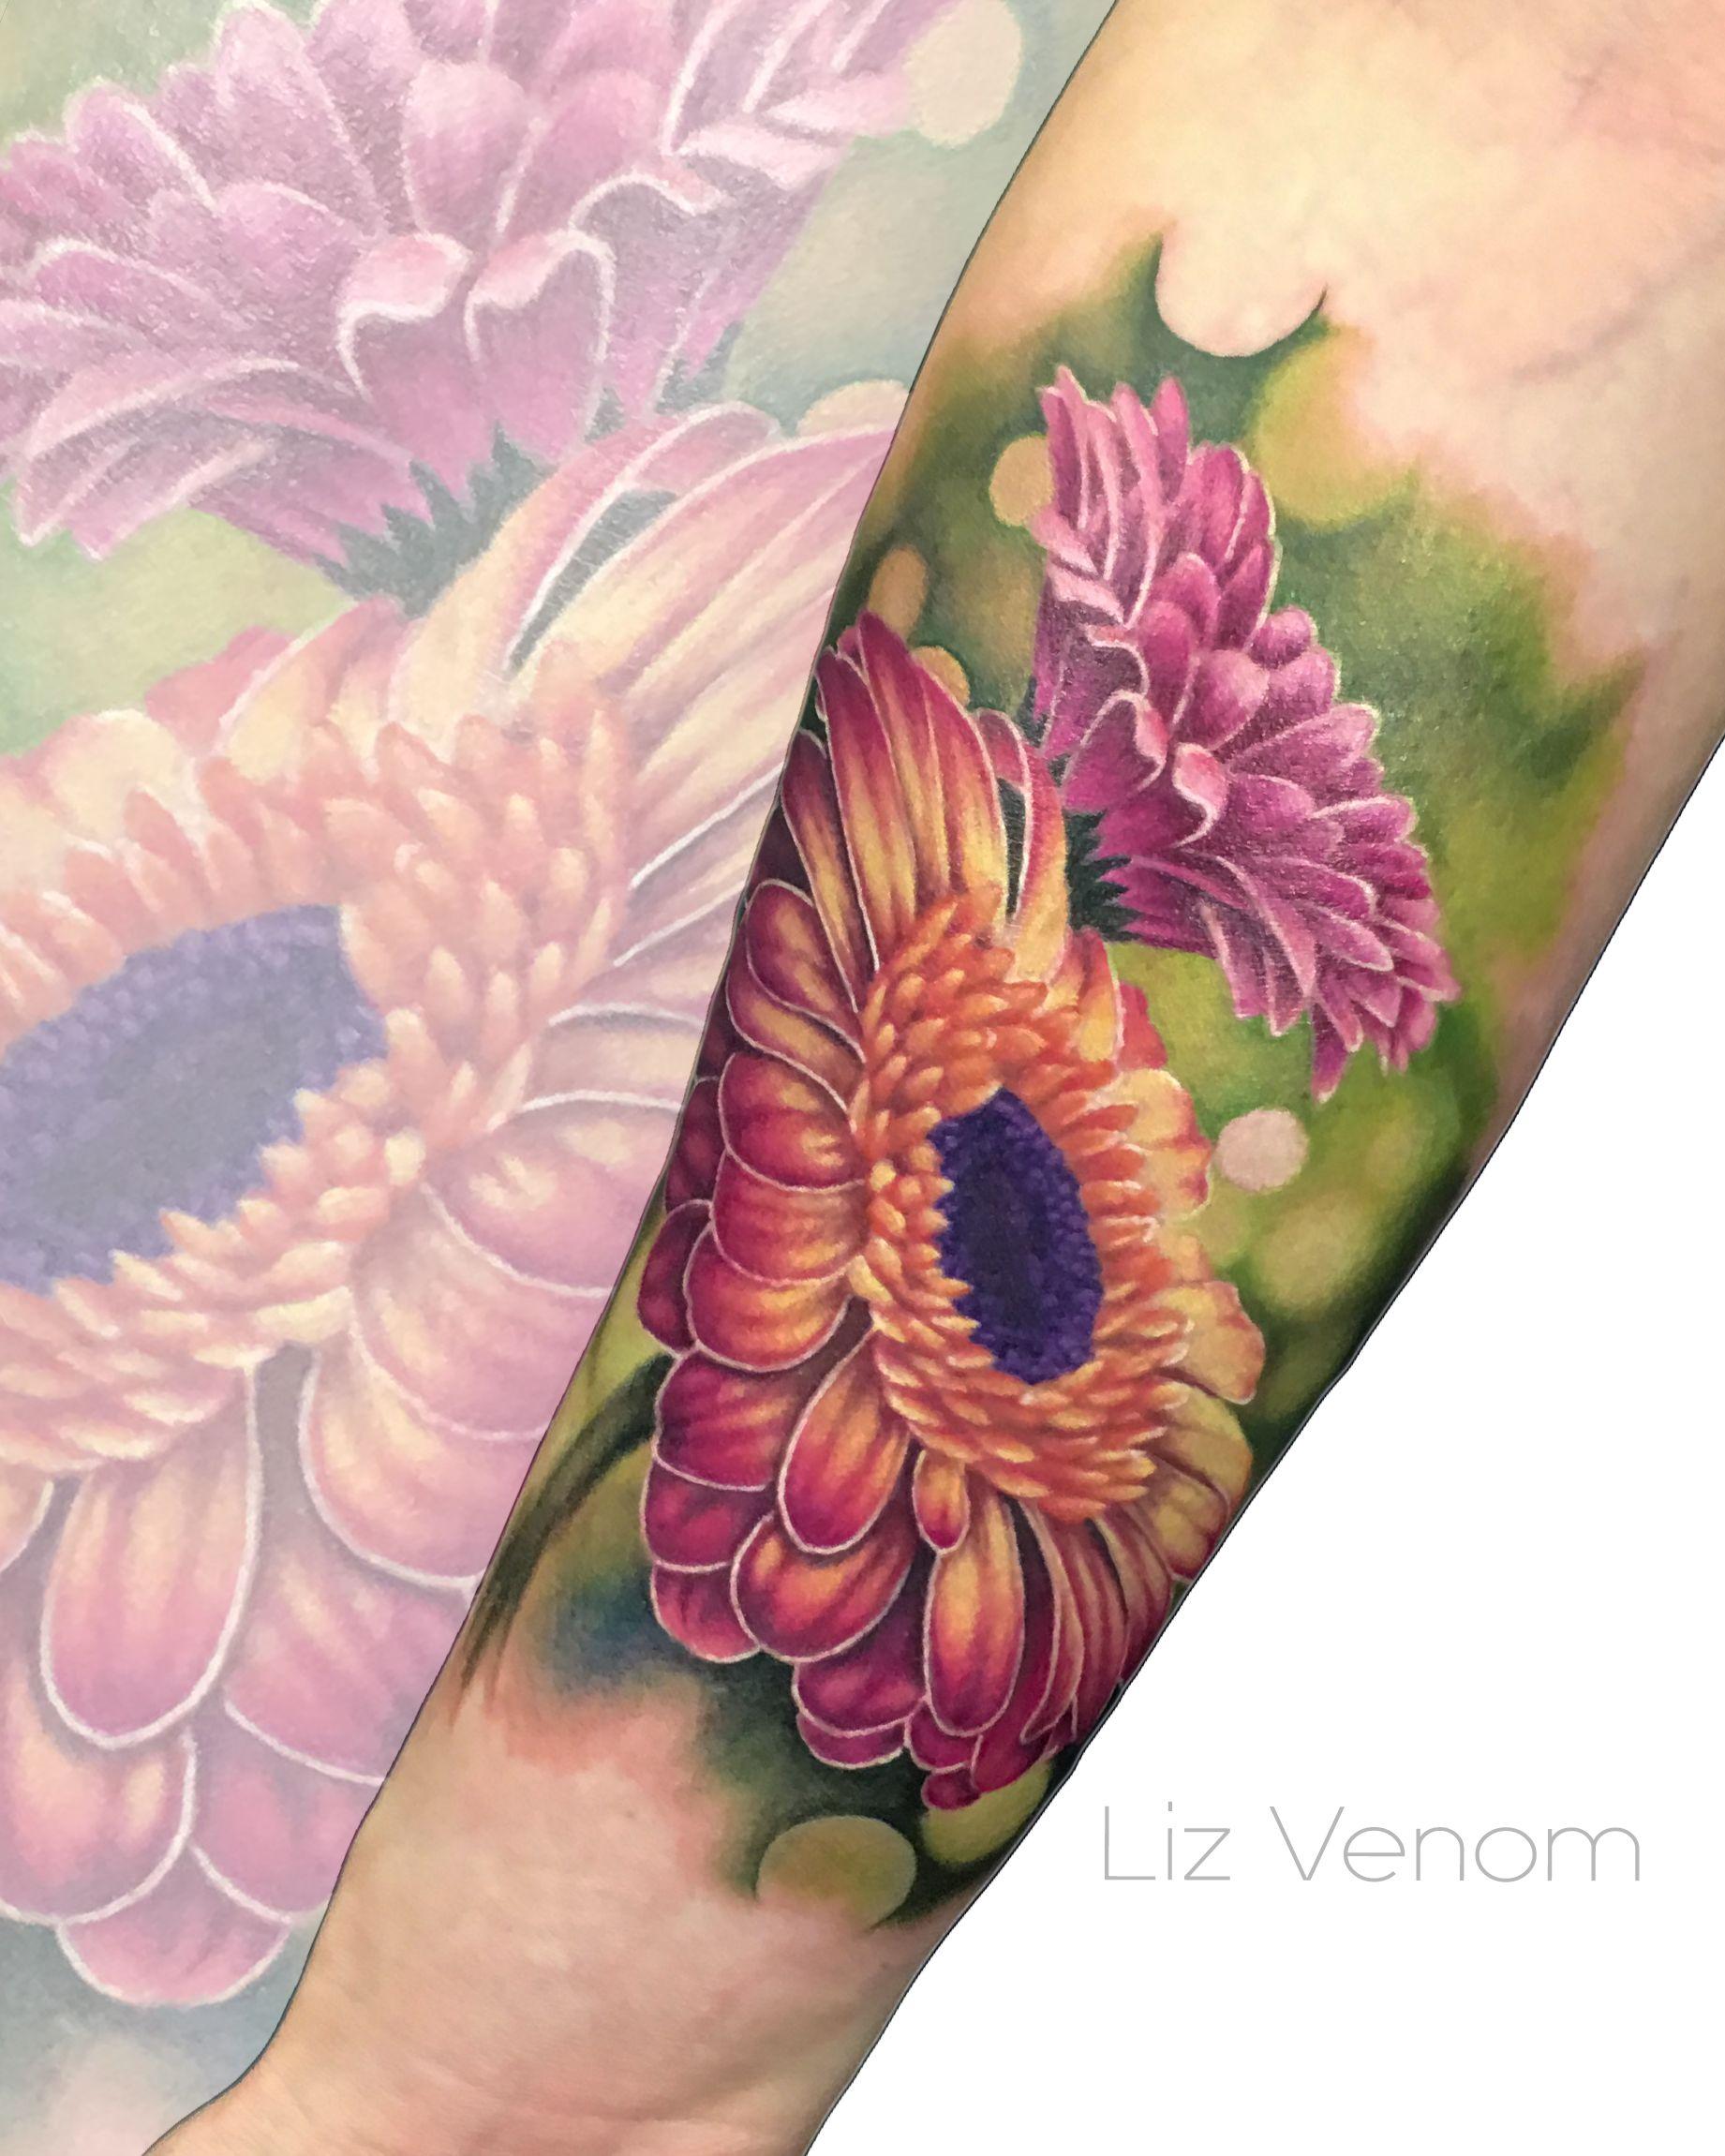 Gerbera Daisy Tattoo By Liz Venom Tattoo Tattoos Ink Art Roses Feminine Girly Women Perf Flower Tattoo Shoulder Daisy Tattoo Vintage Tattoo